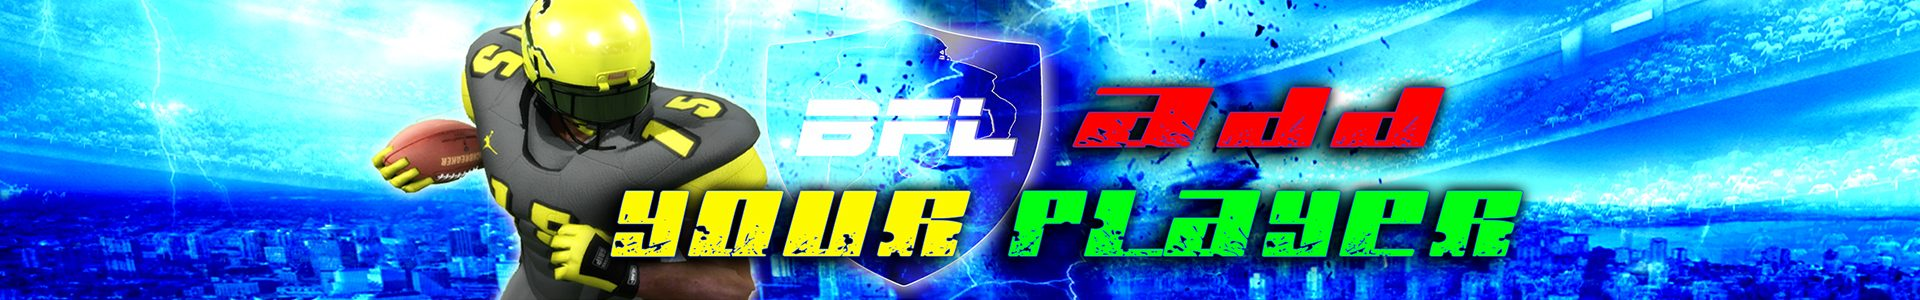 Backbreaker Football League Homepage Banner